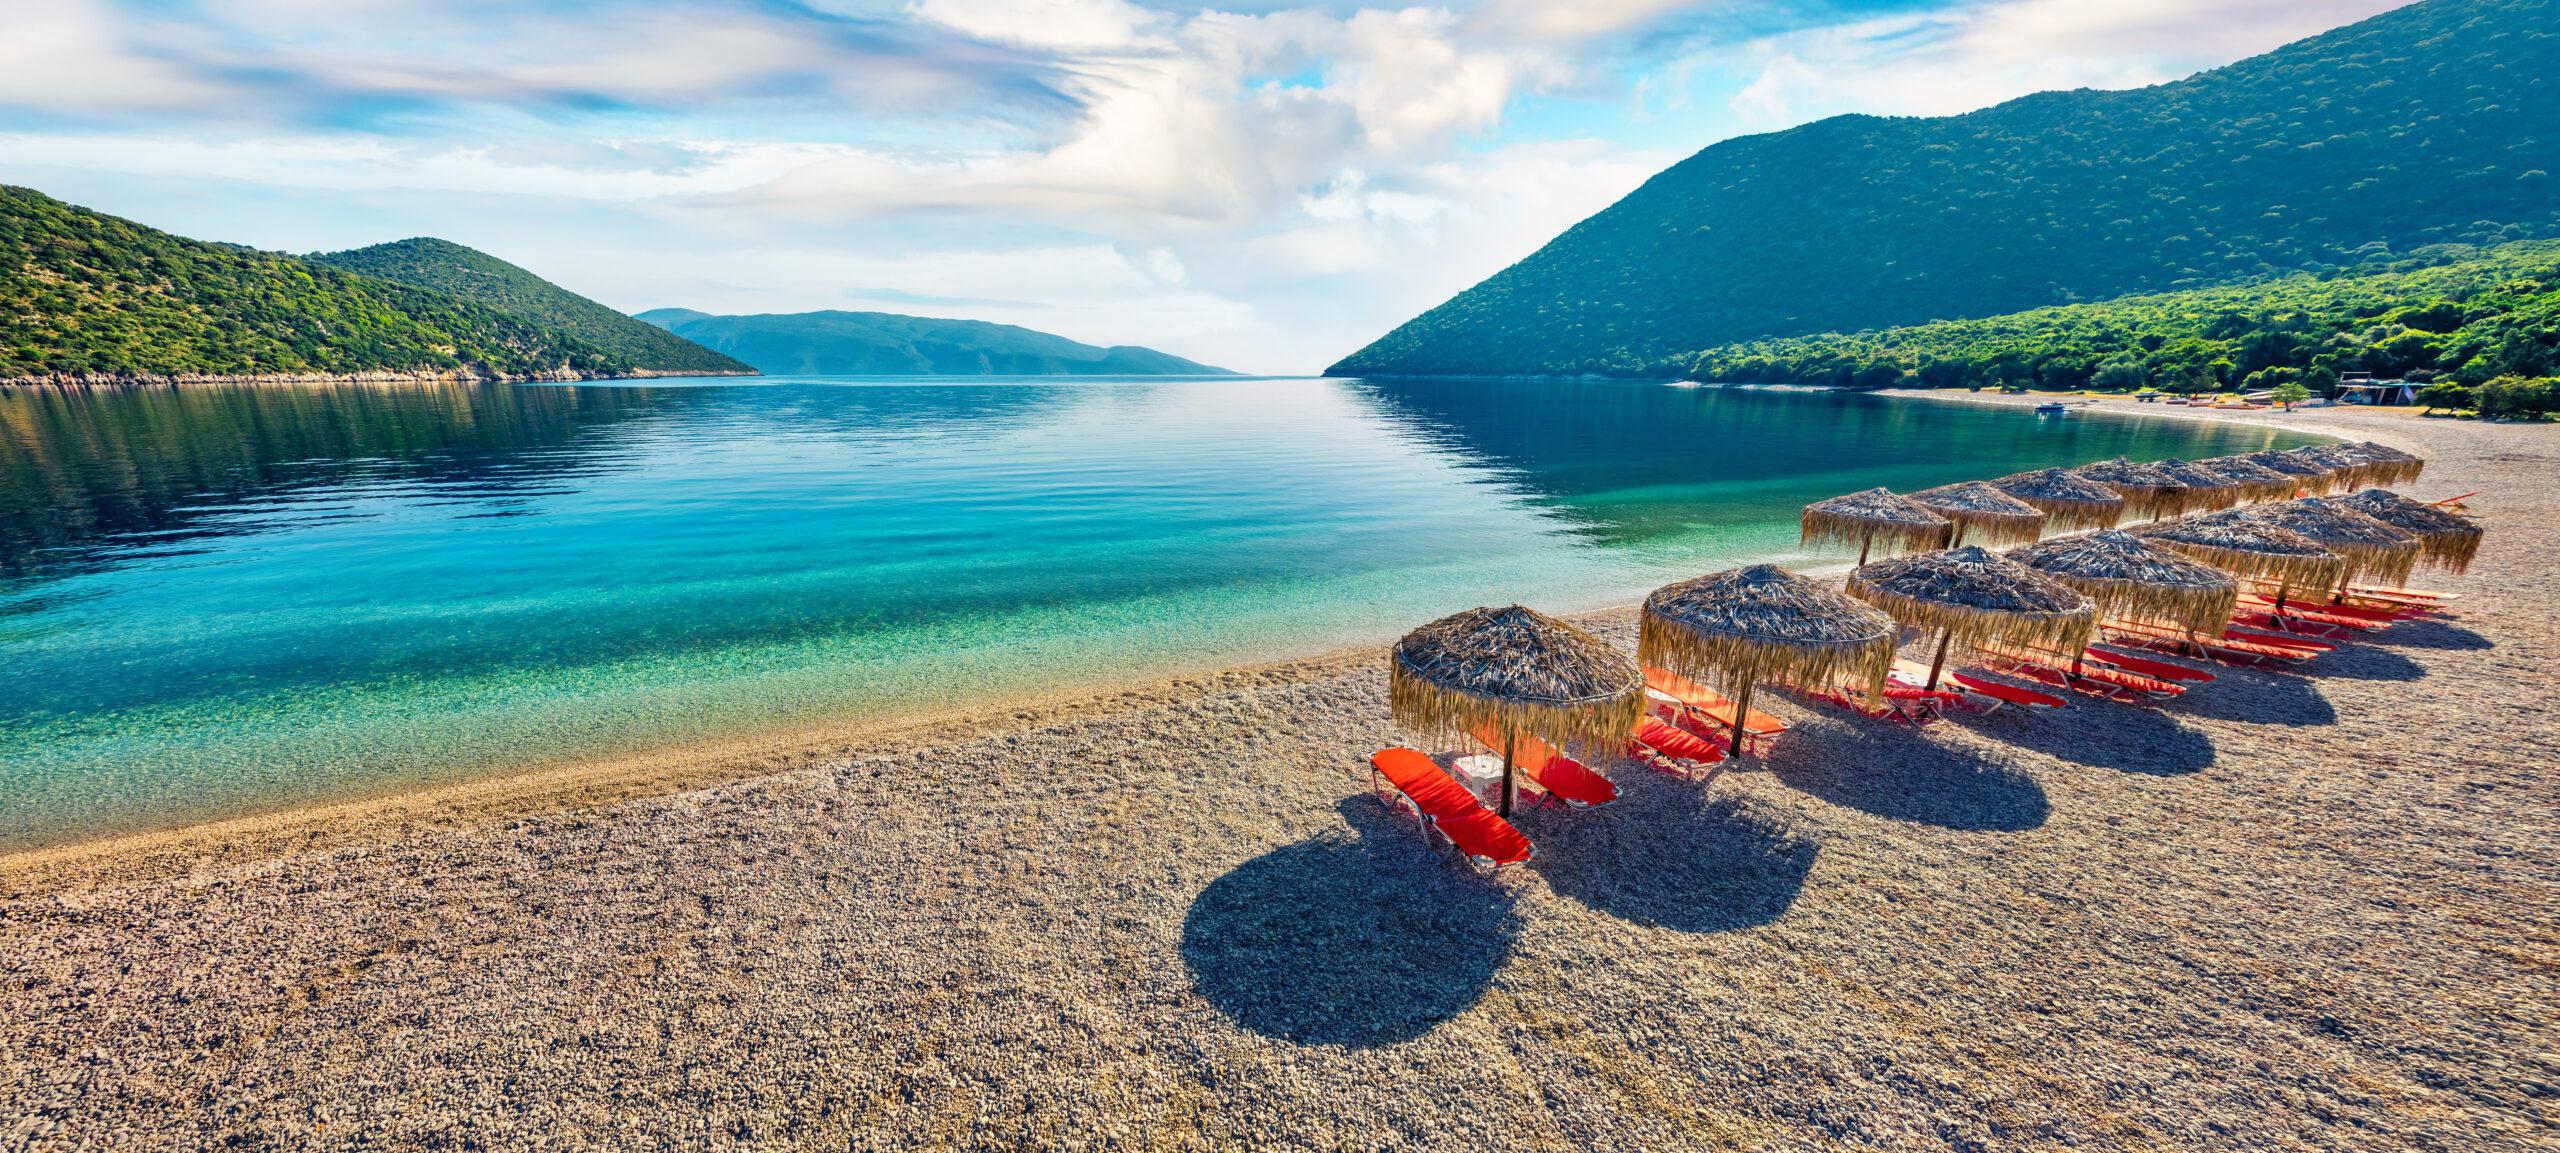 Mirror-like crystalline water at Antisamos beach